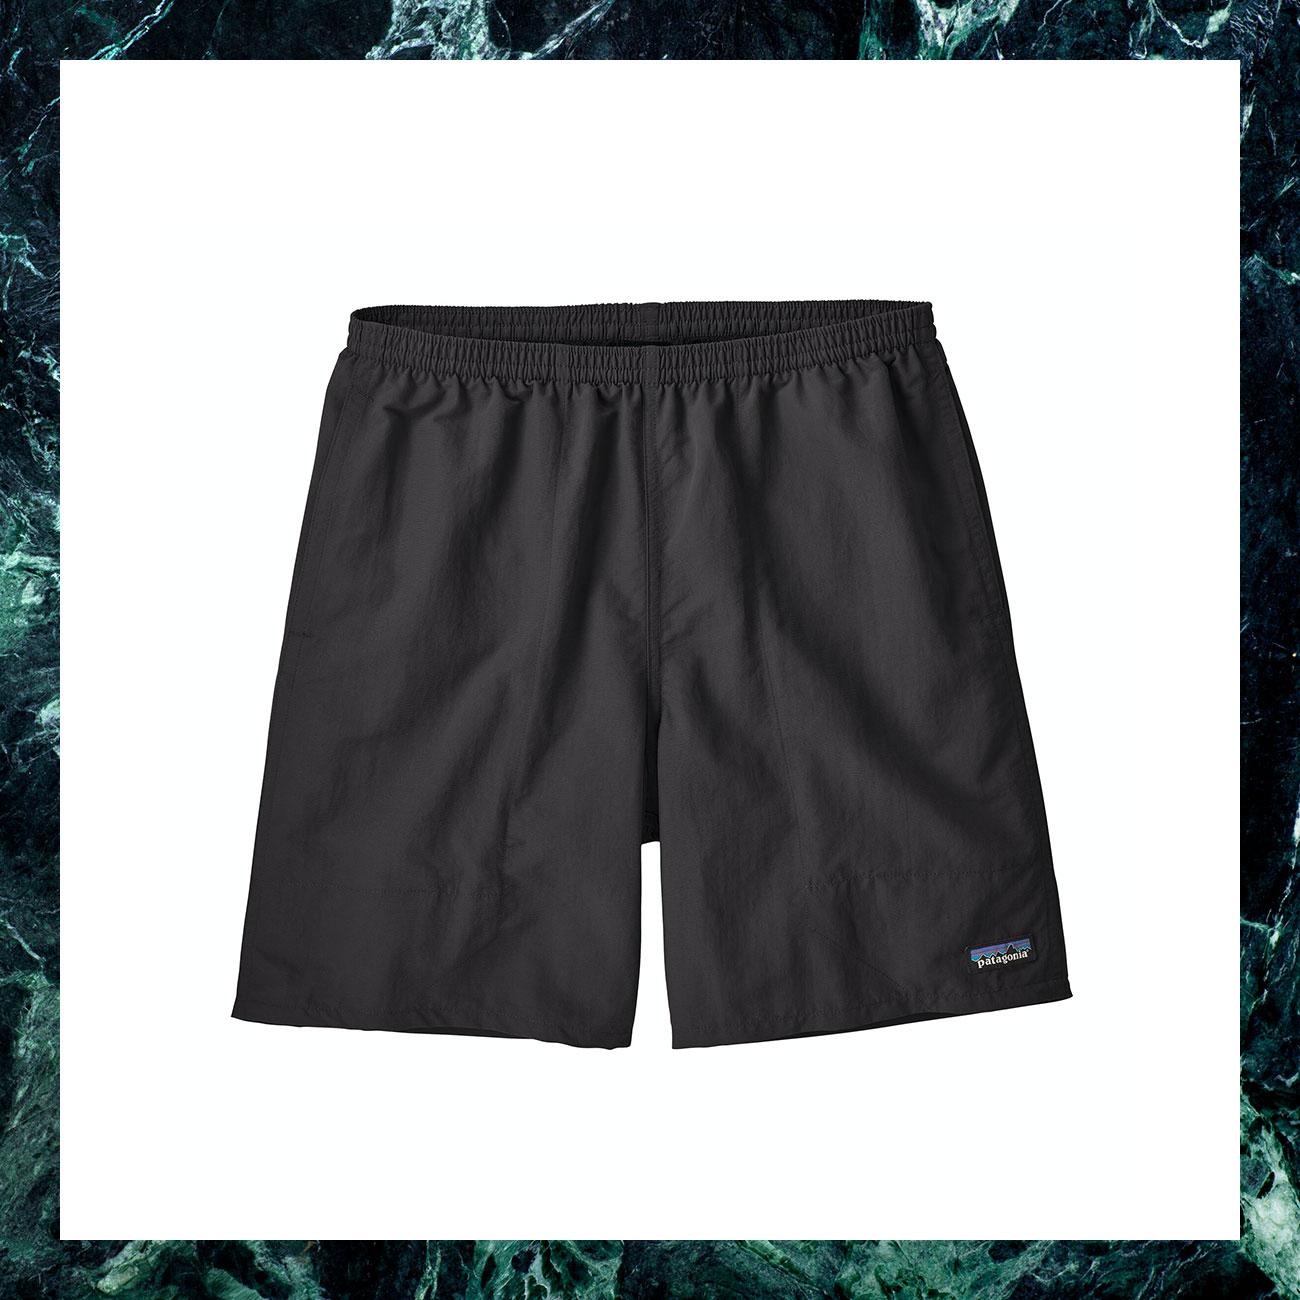 Sean John NEW Black Mens Size 2XL Track Moleskin Elastic-Waist Shorts $69 099